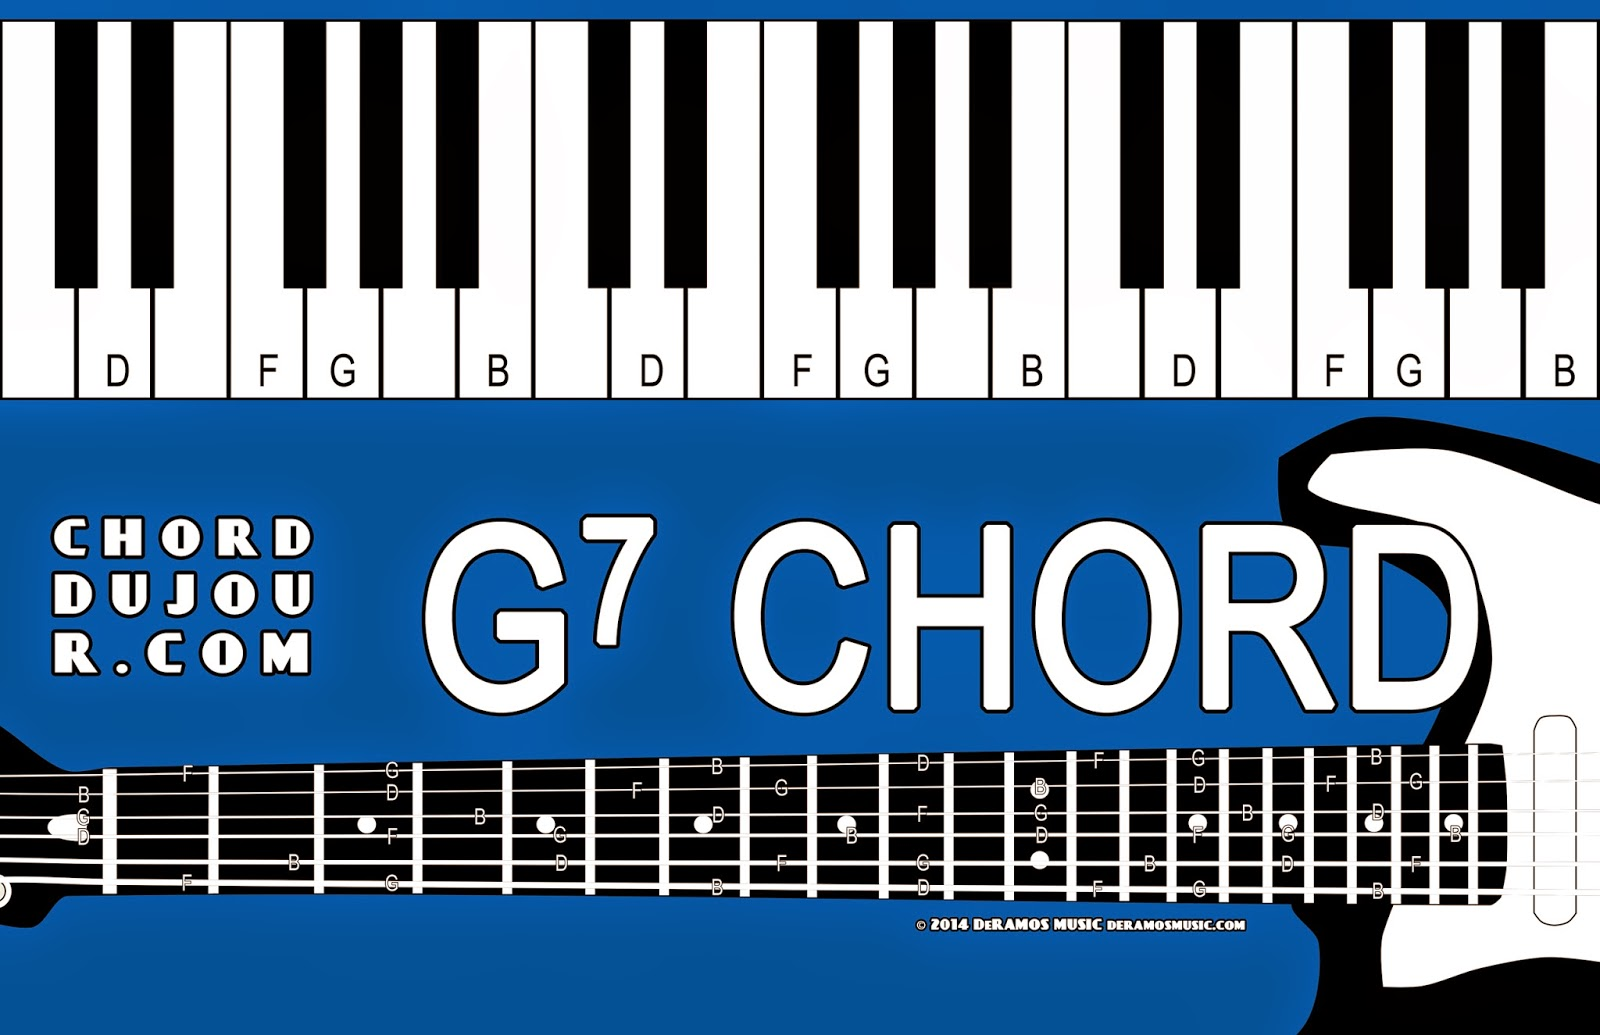 Chord du jour april 2014 dictionary g7 chord hexwebz Gallery